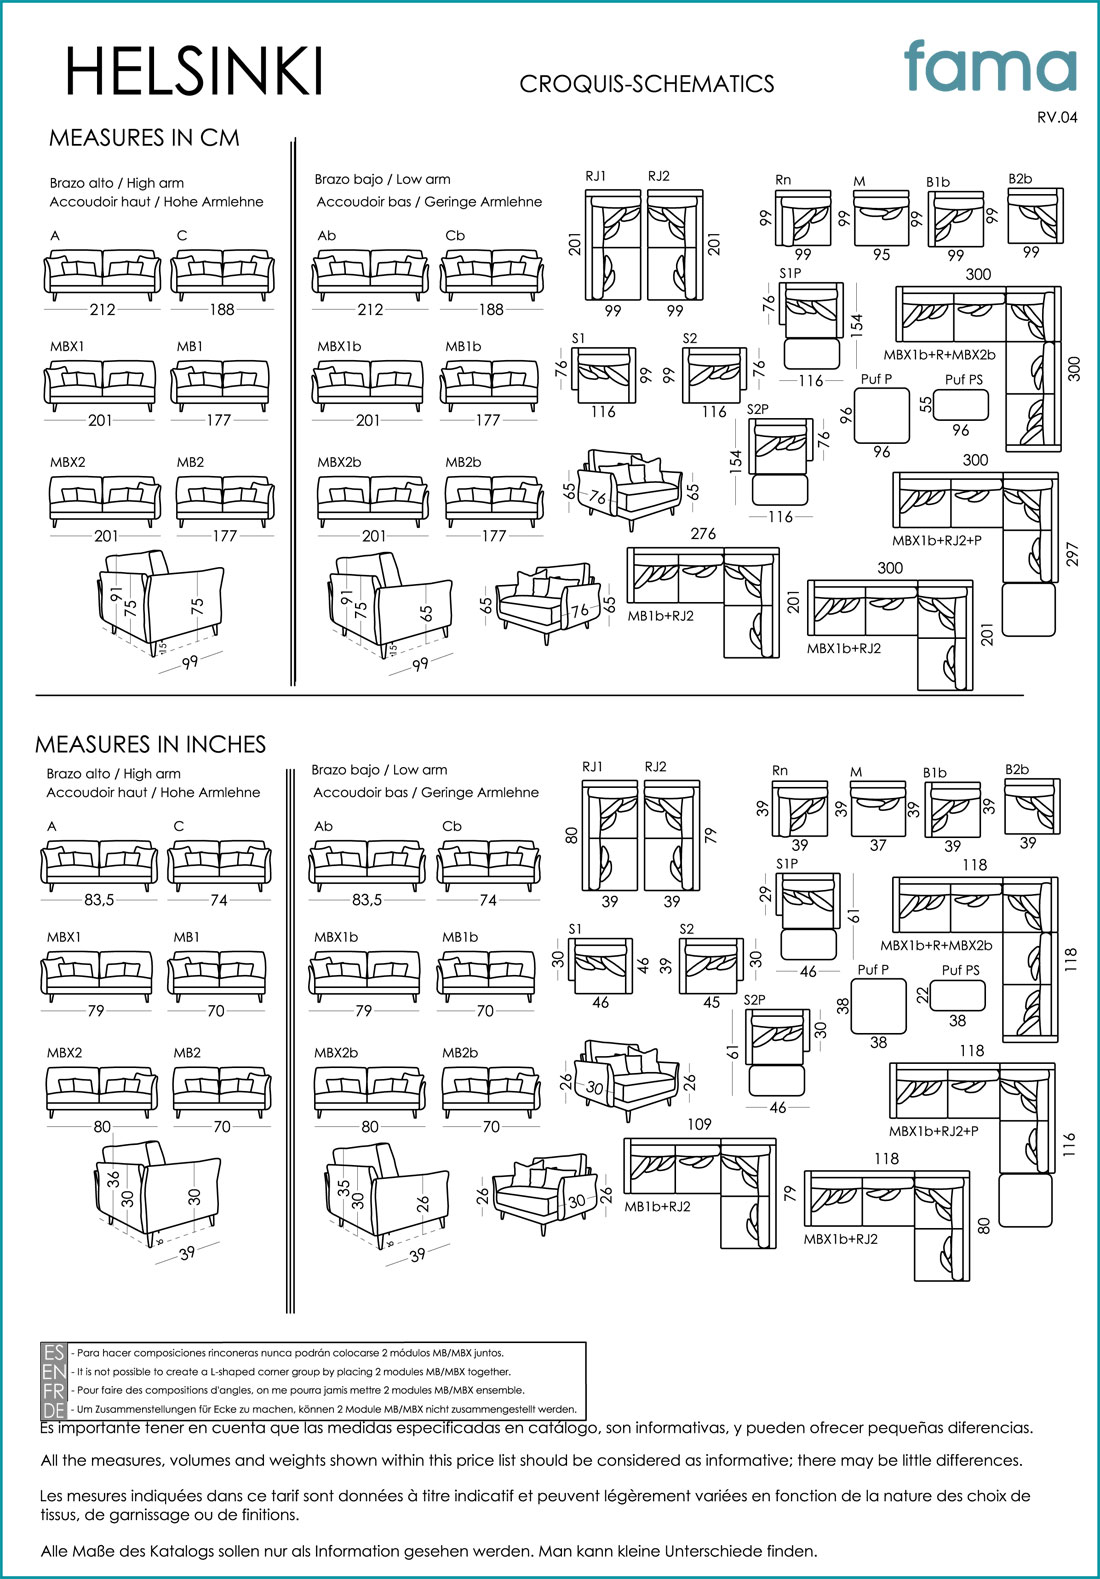 sofa-modern-meuble-contemporaine-famaliving-montreal-helsinki-specification